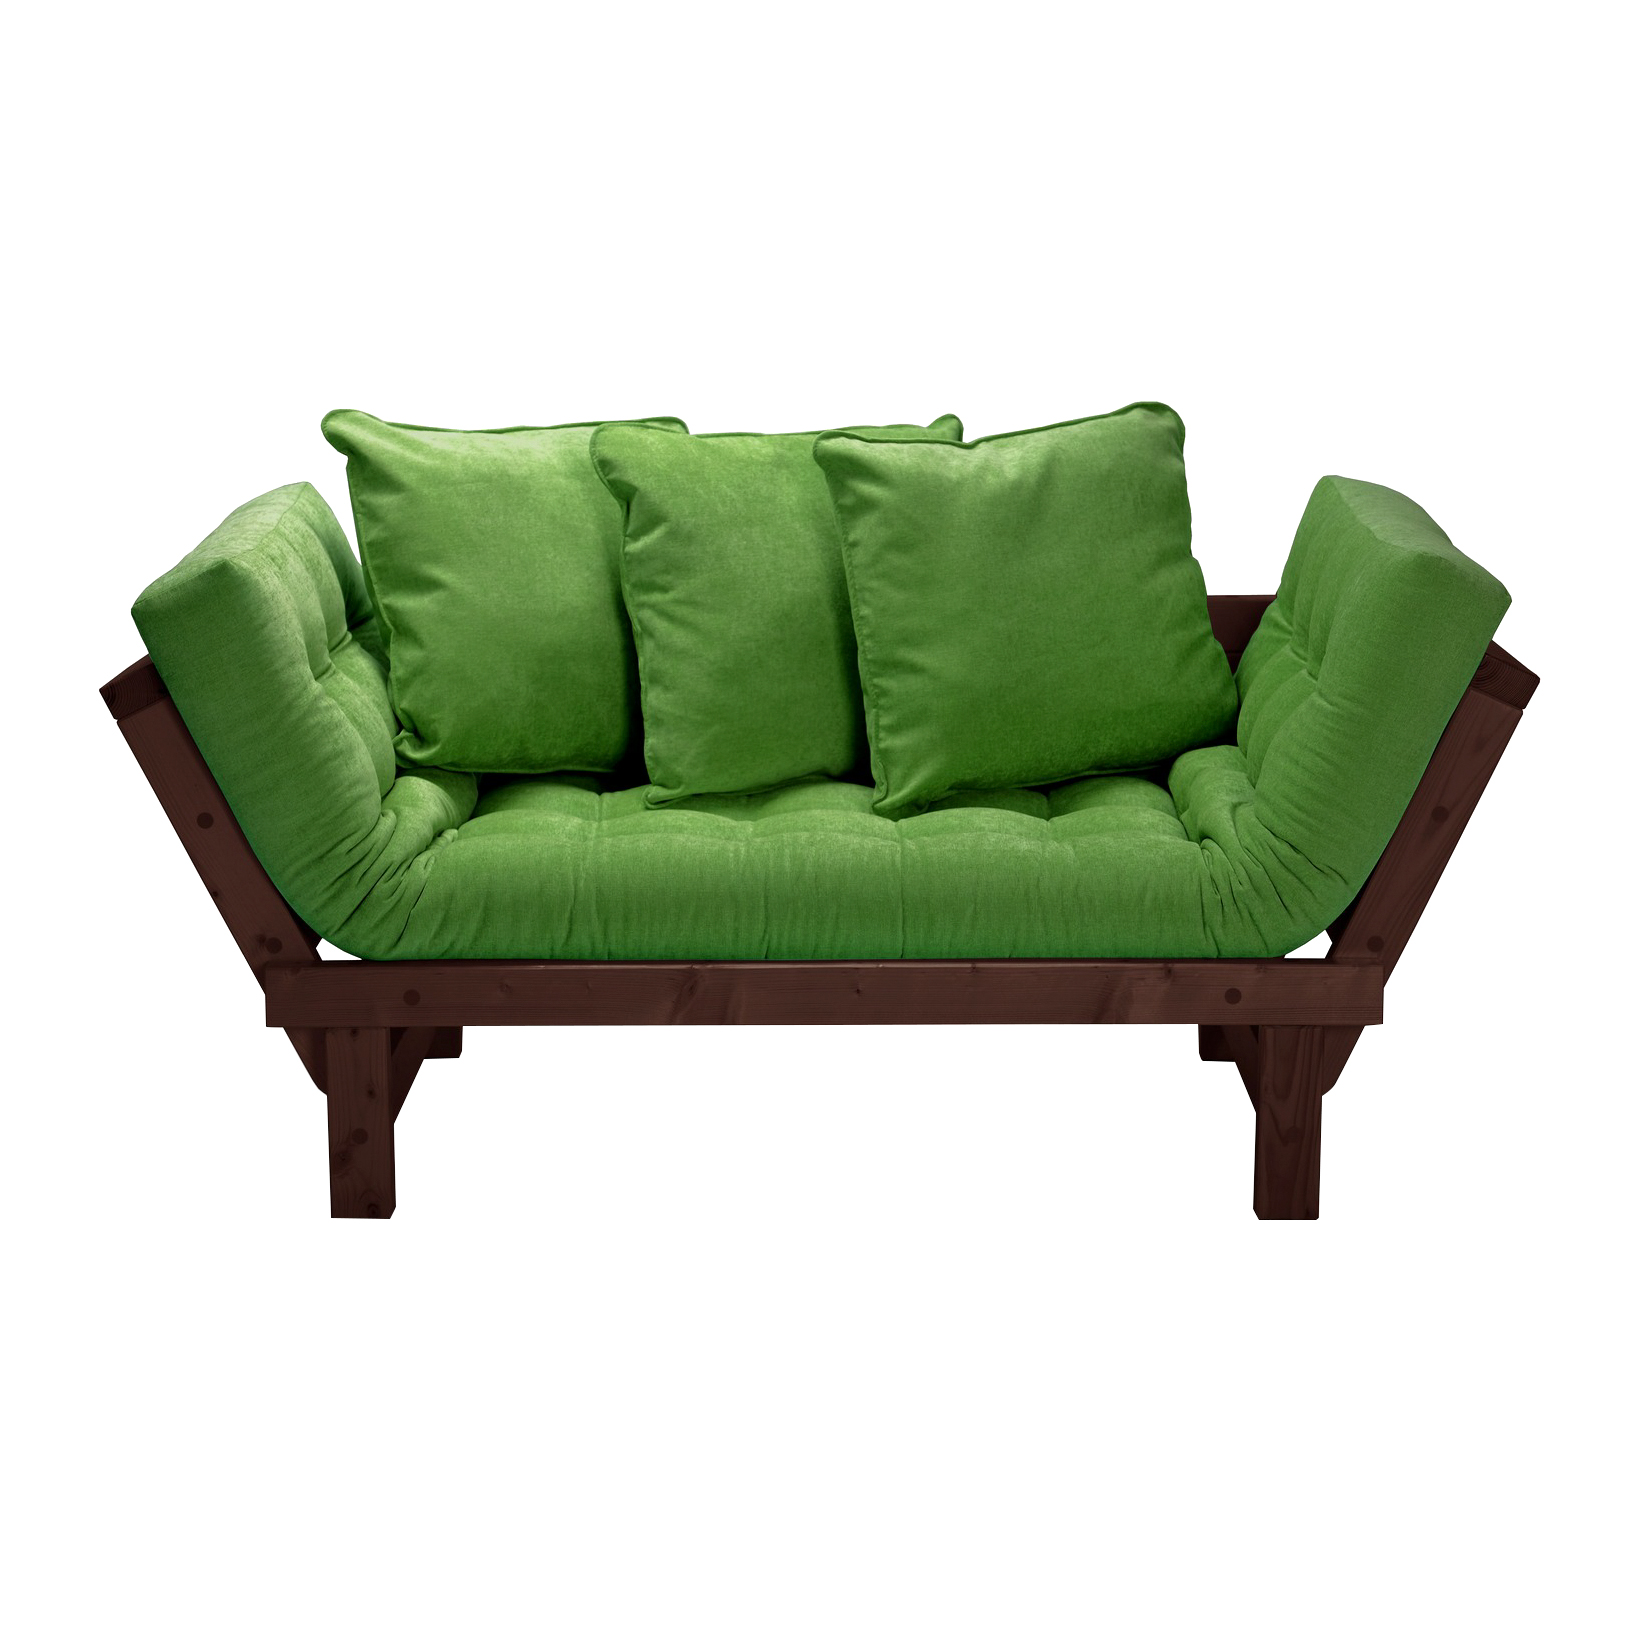 Кушетка AS Санди 158x77x61 венге/зеленый кушетки